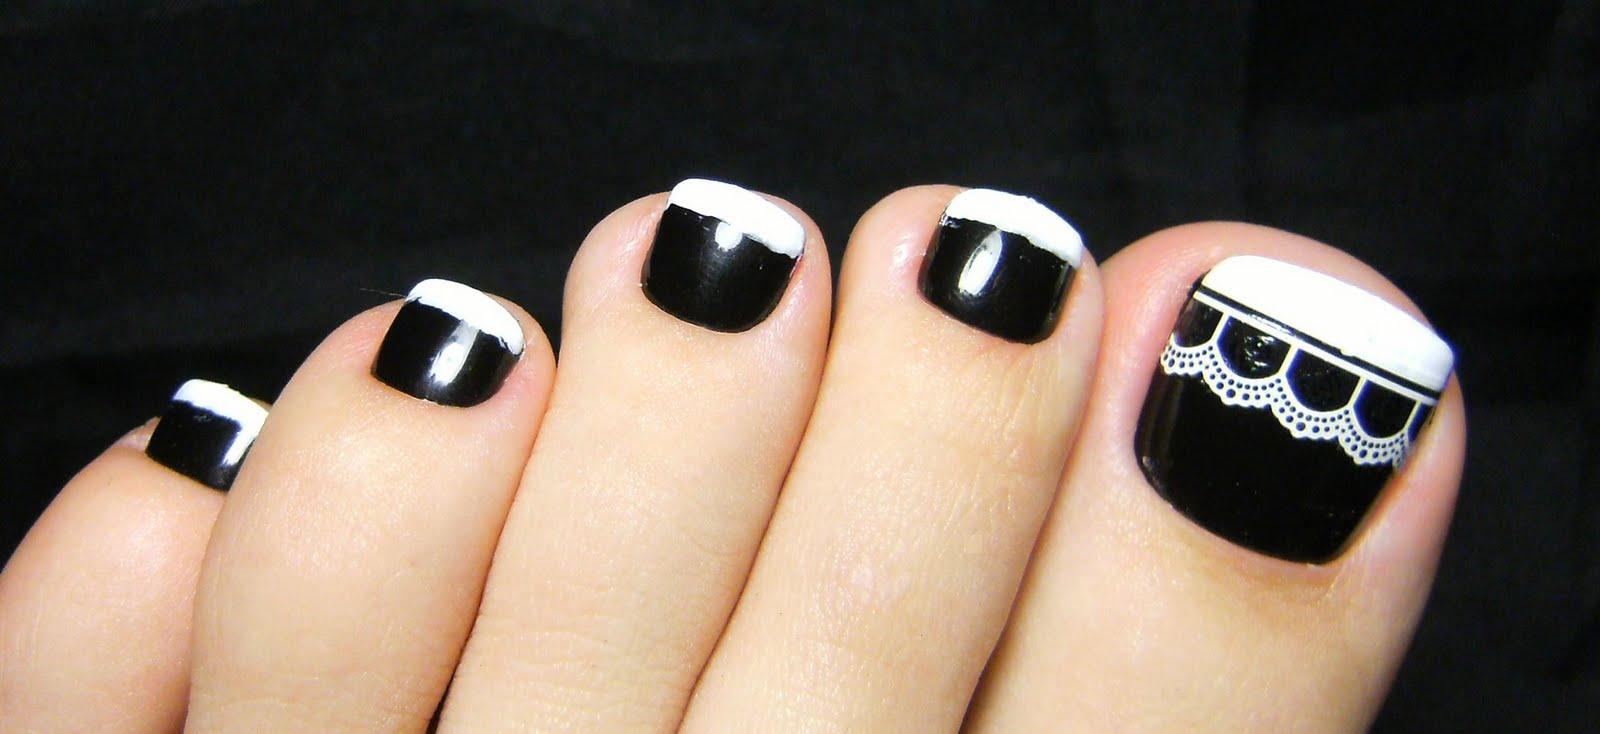 Deez Nailz Nailene French Tip Pen Amp Beauties Factory Stickers